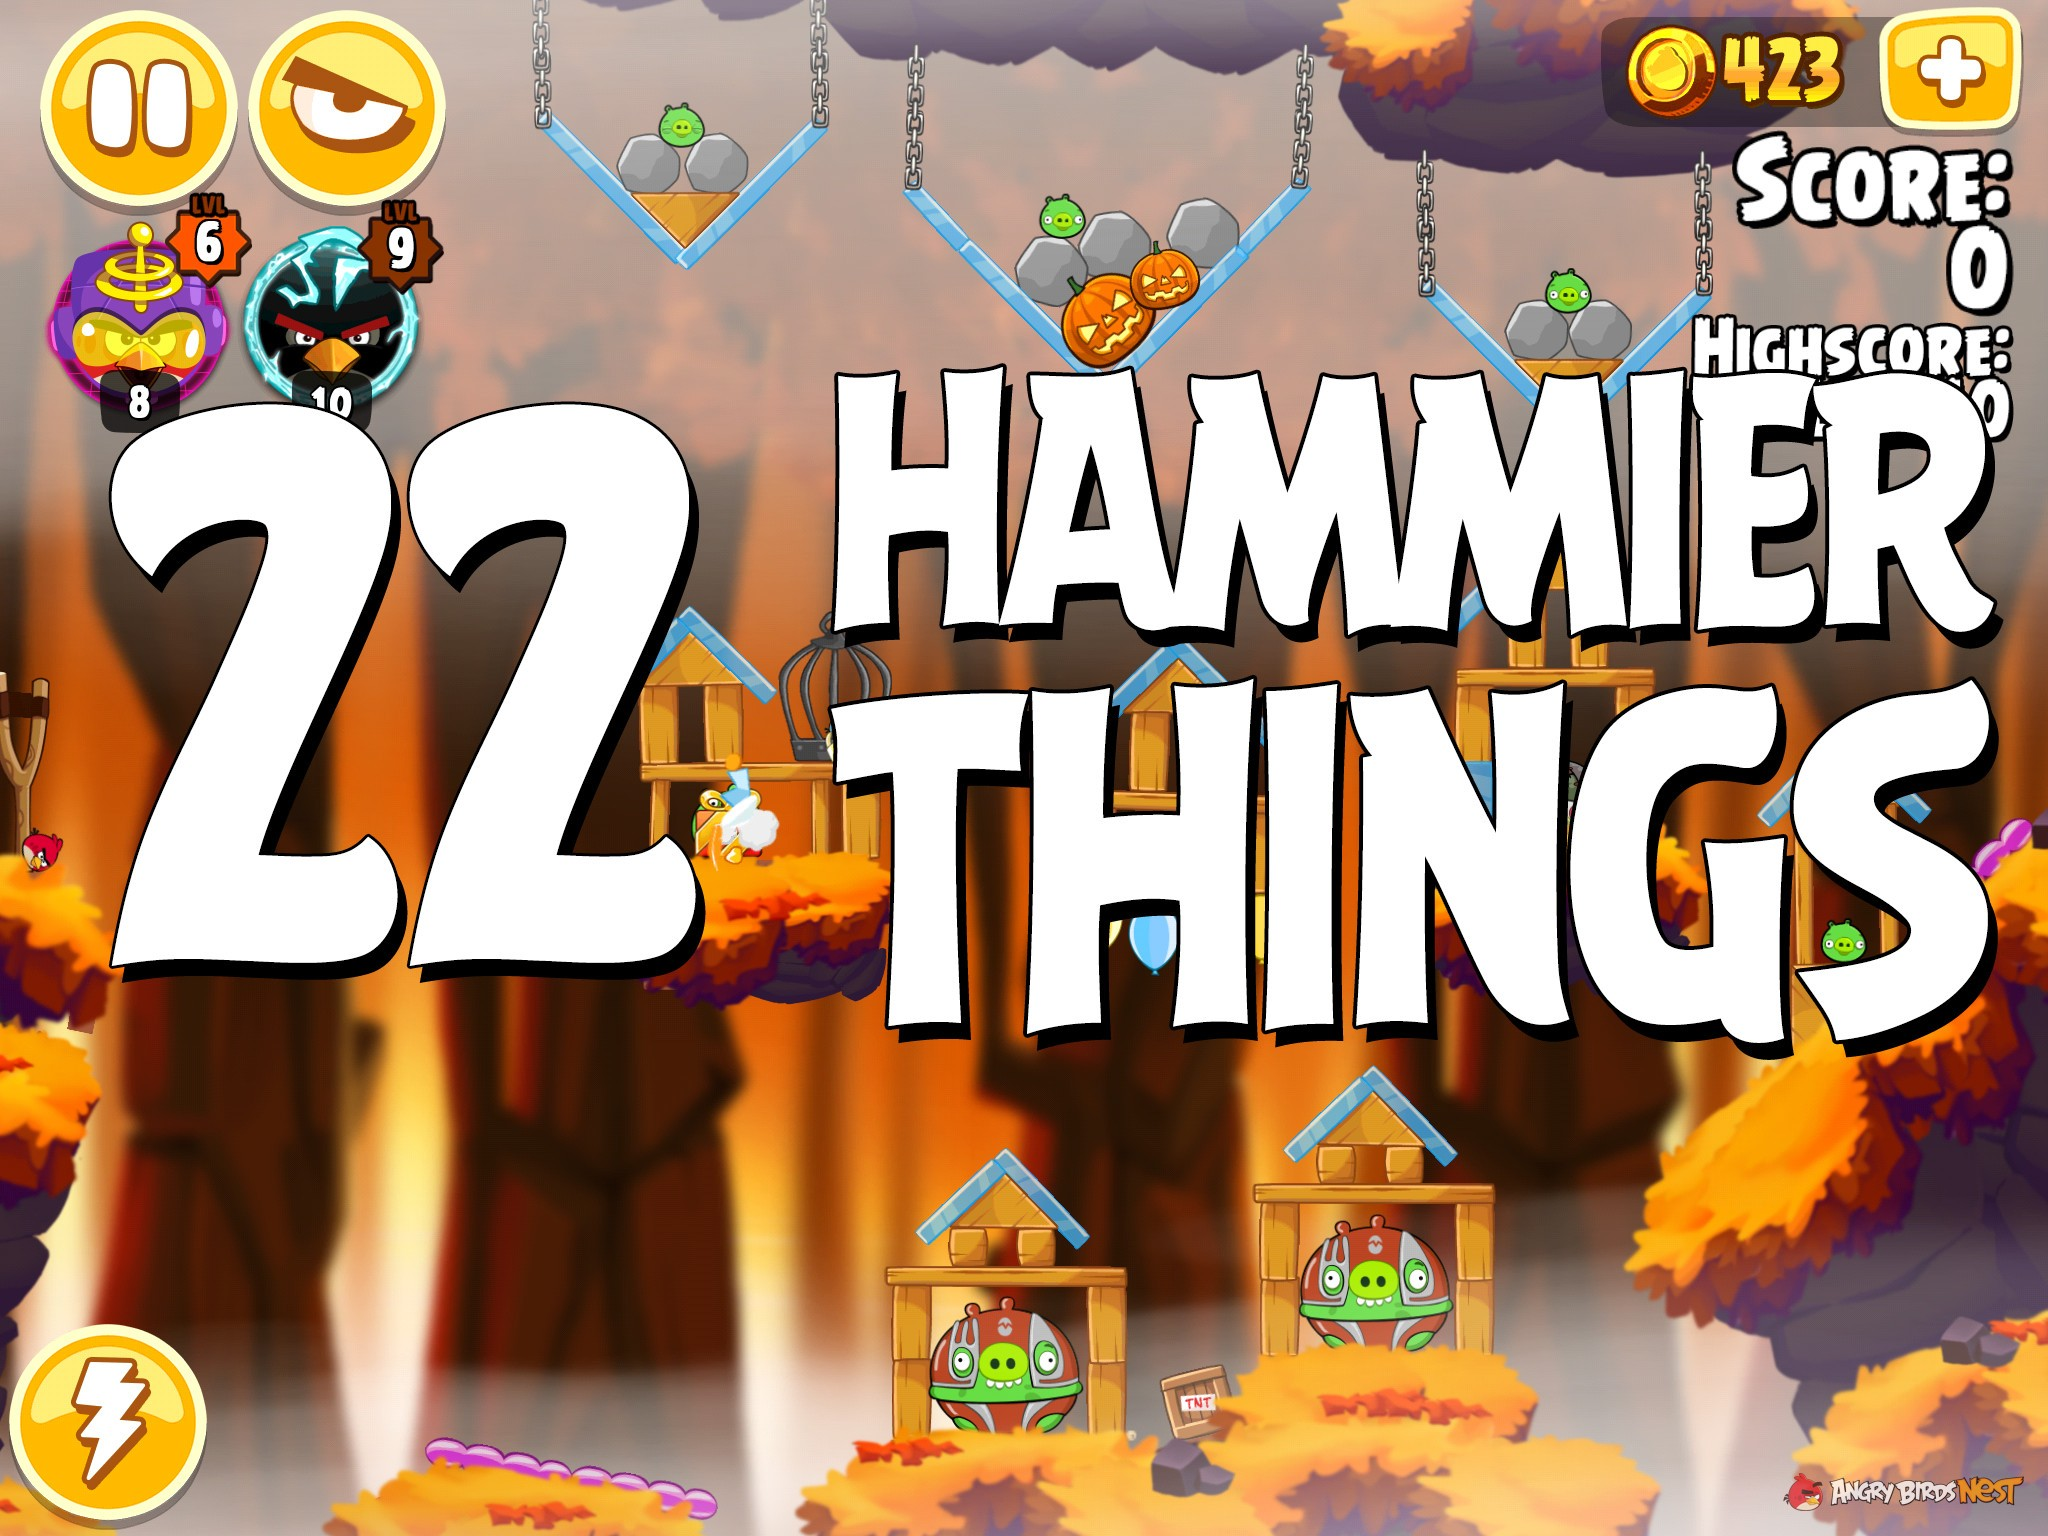 Angry Birds Hammier Things angry birds seasons hammier things level 1-22 walkthrough